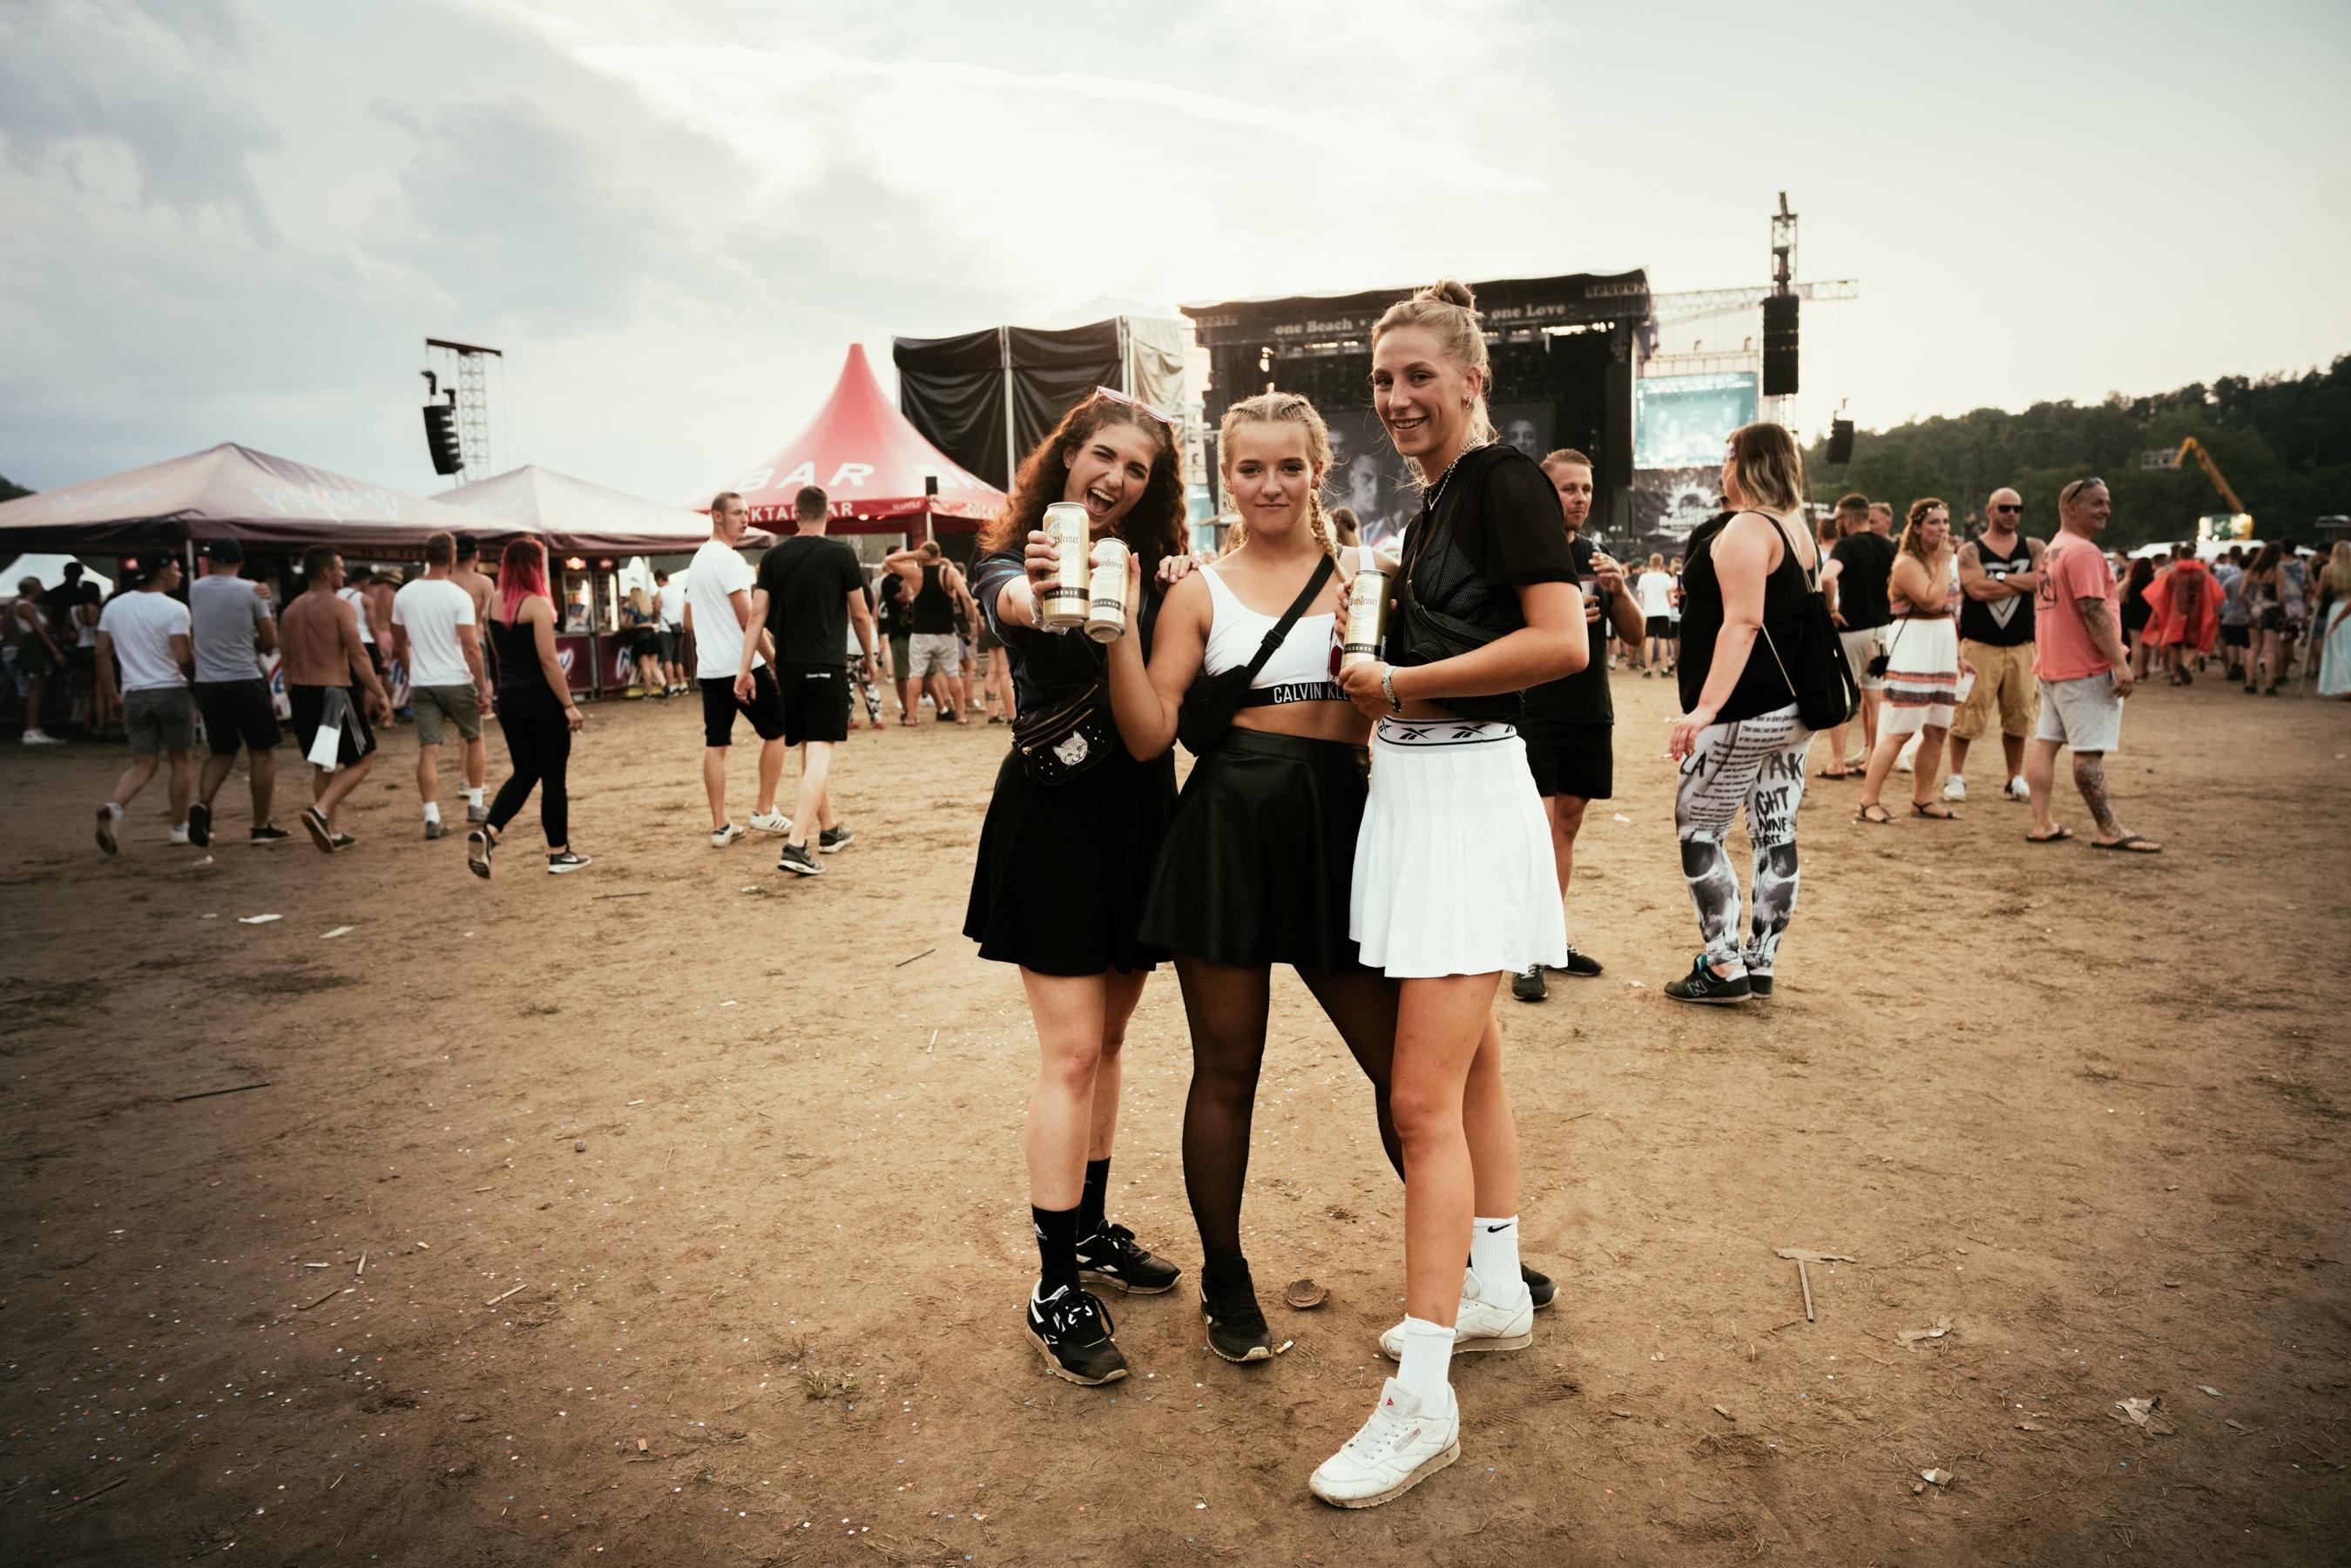 28-07-2018 Helene Beach Festival_Impressions-53